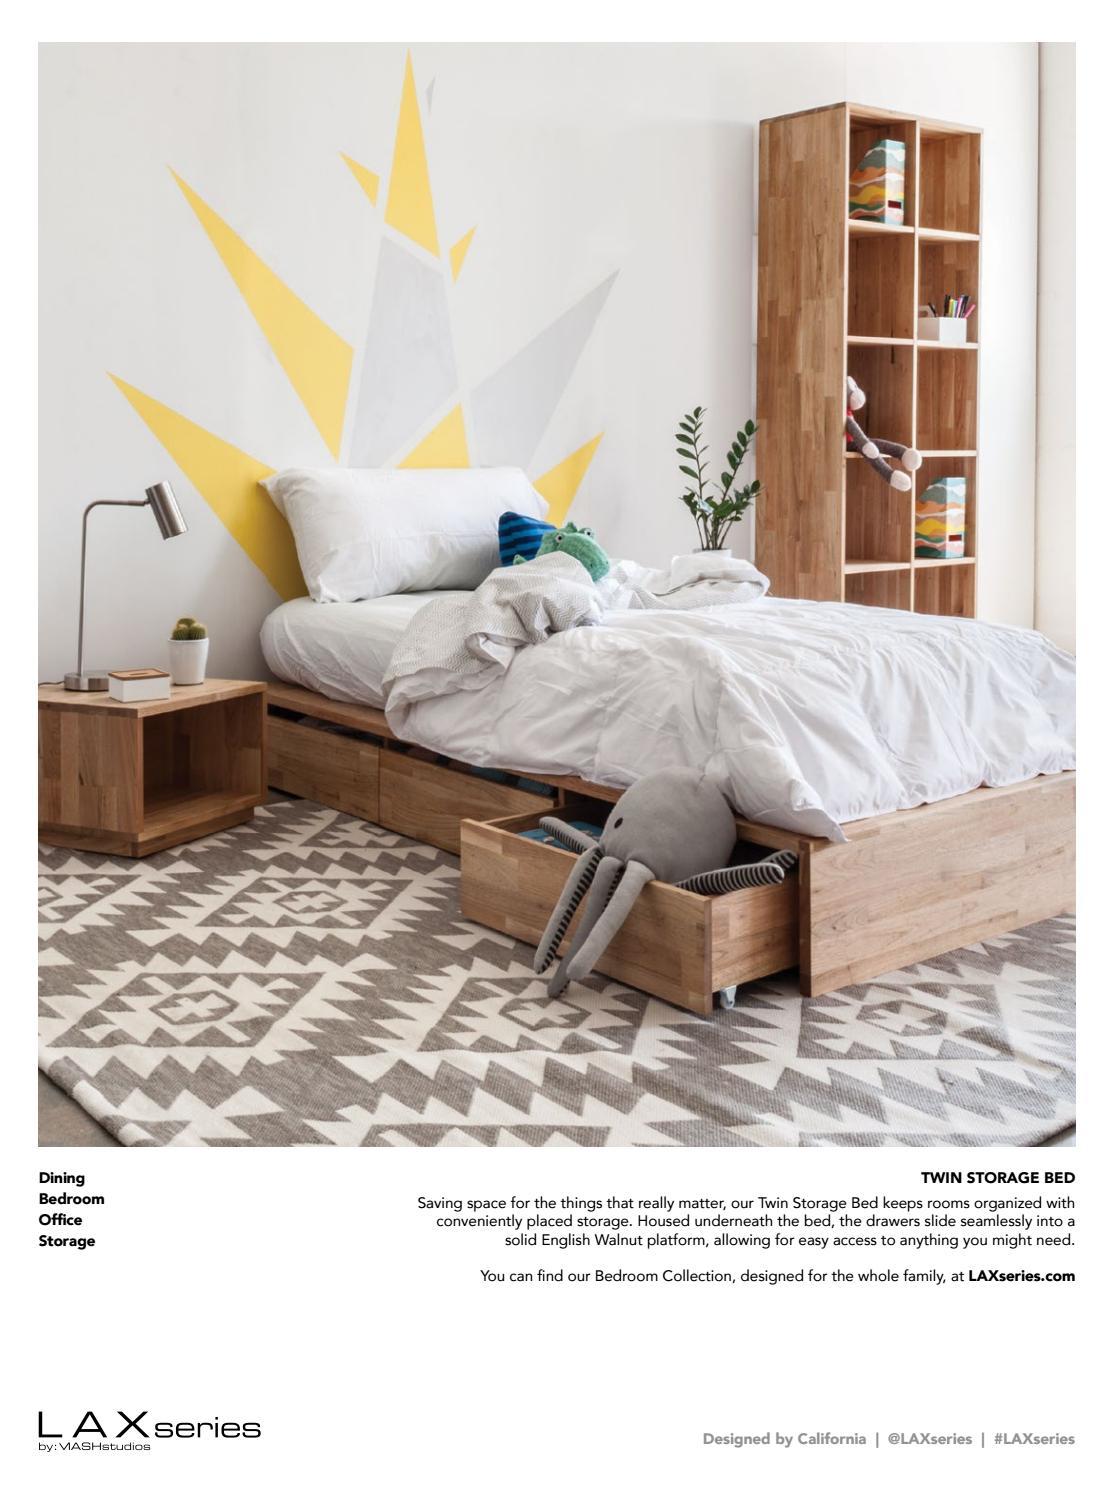 Lax Series Platform Bed c california stylec magazine - issuu